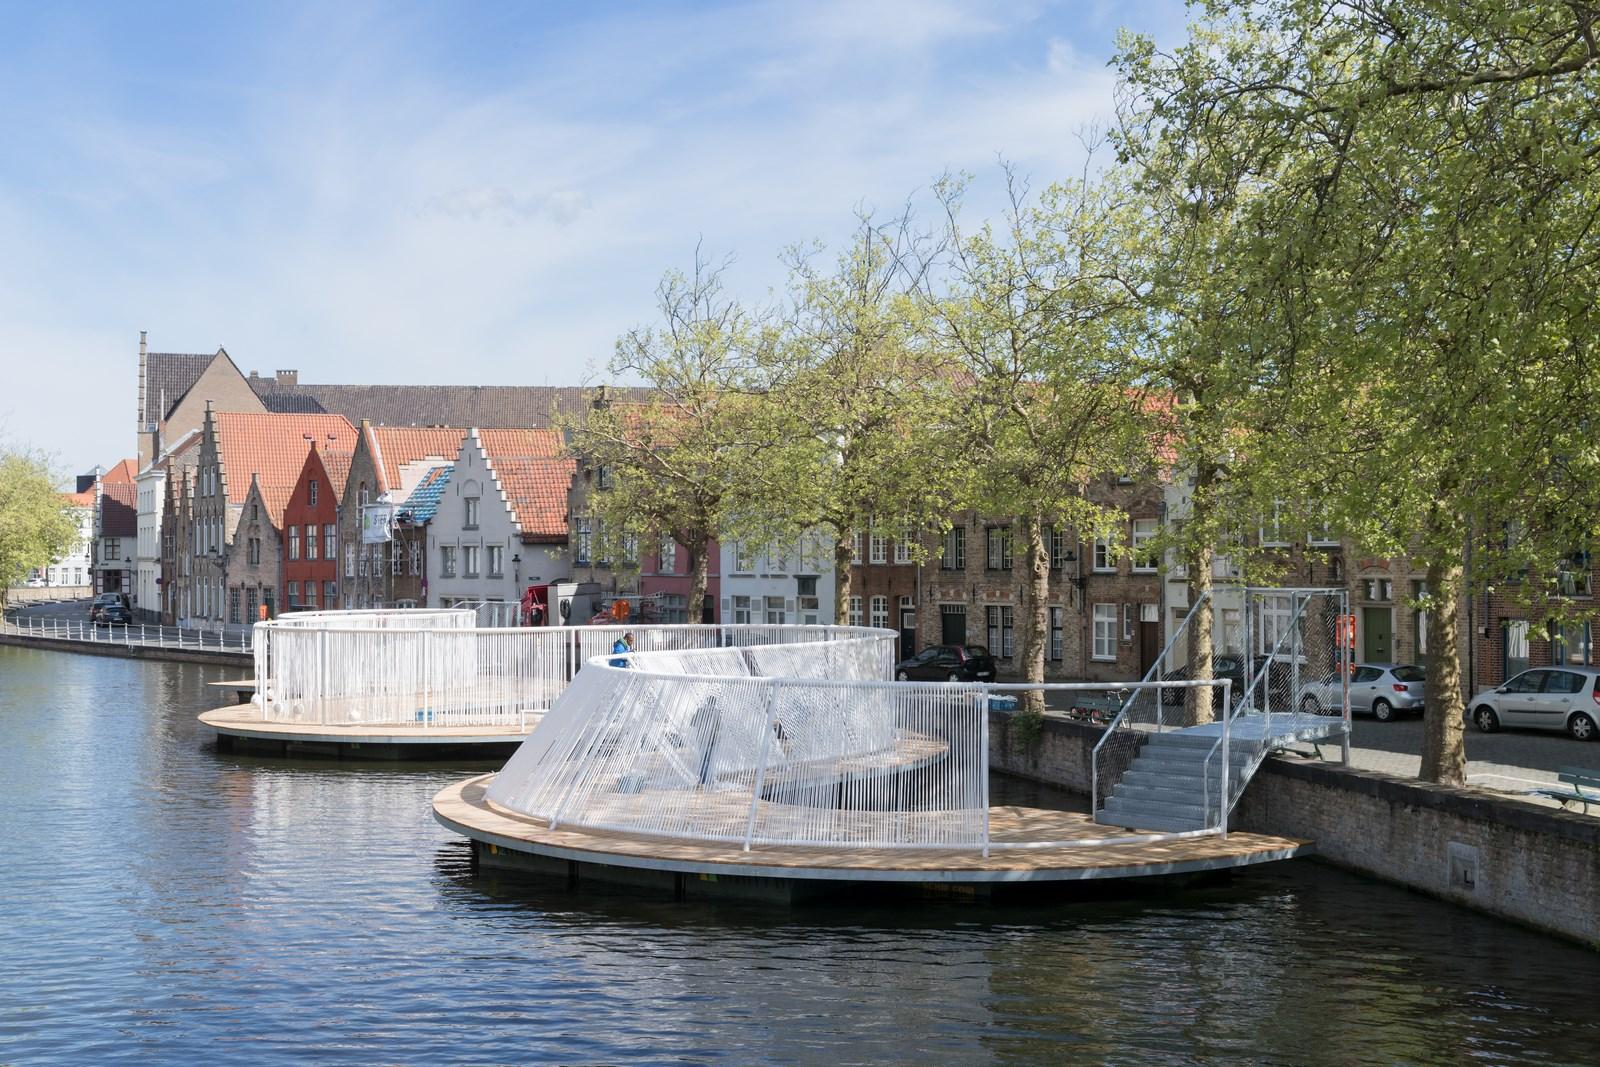 Triennale Brugge 2018_OBBA_The Floating Island_1 Foto Iwan Baan (Copy)